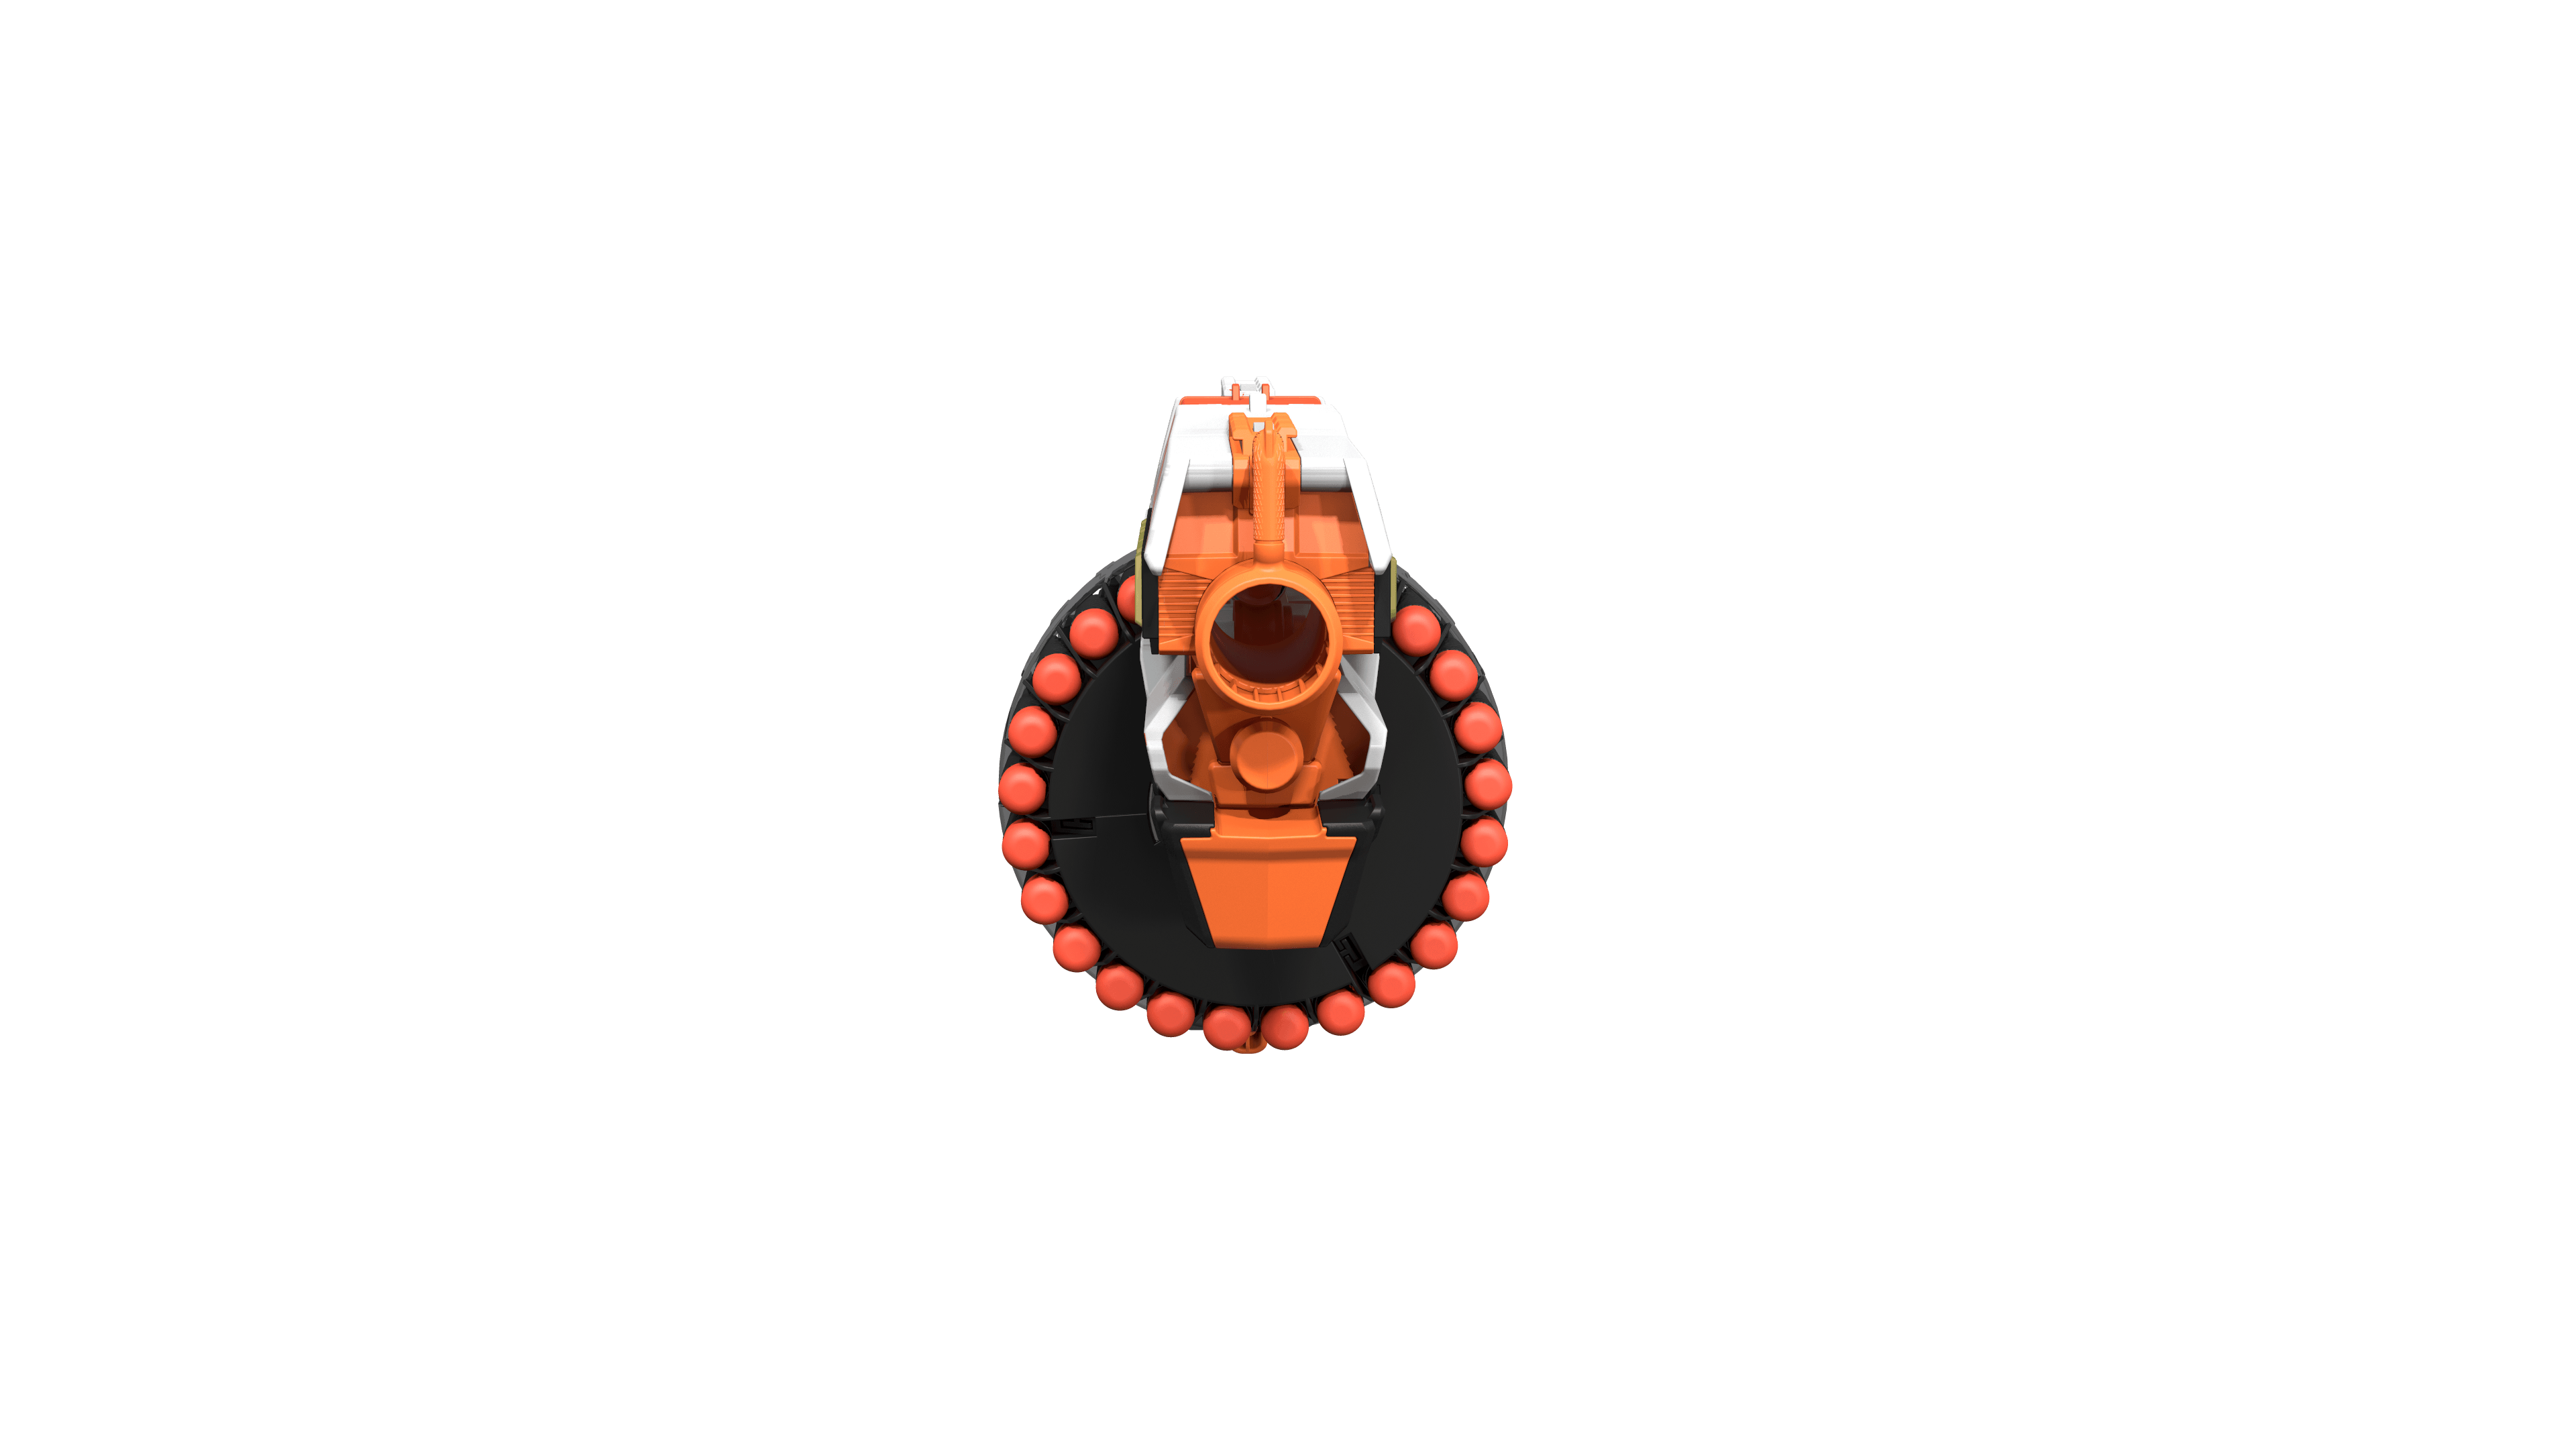 ultra blaster img 93